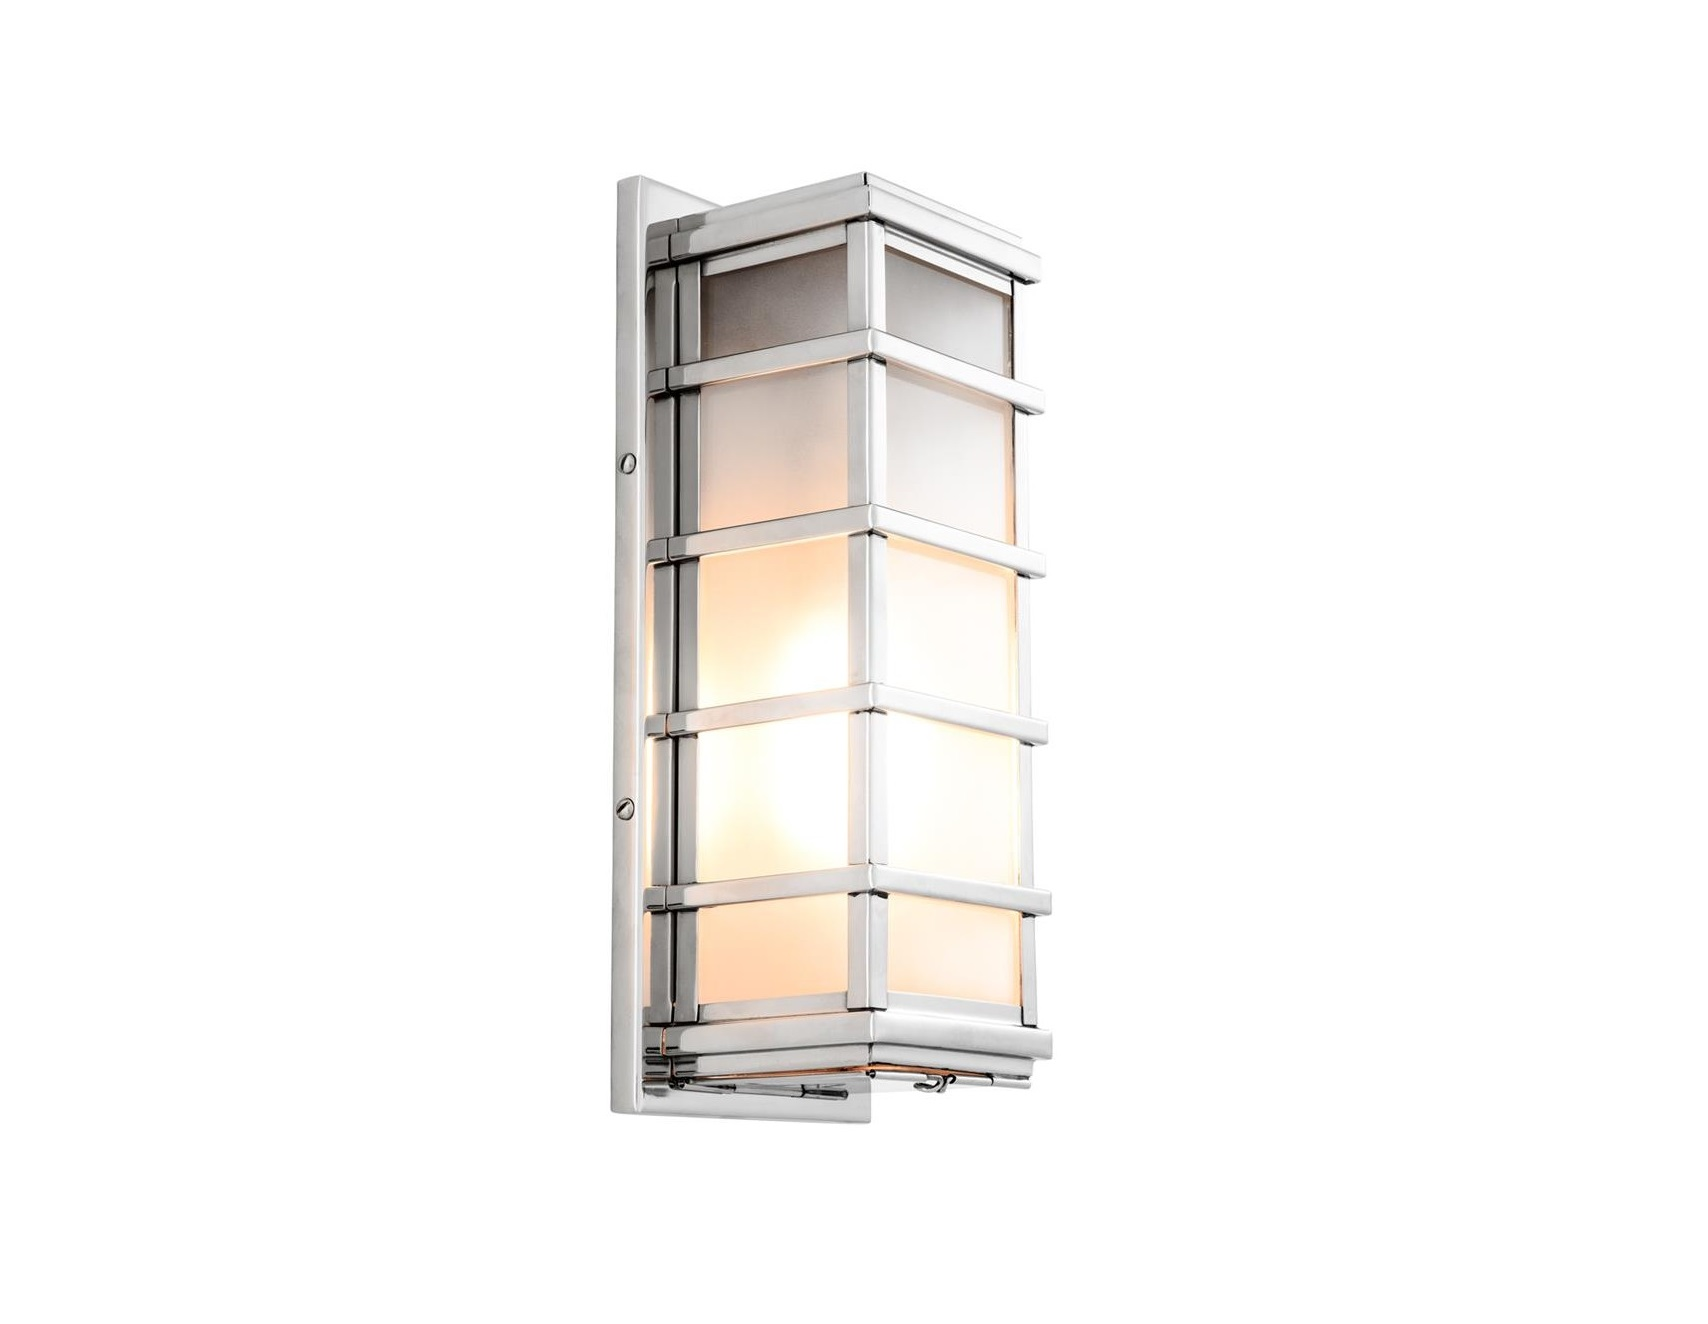 Настенный светильник WelbyБра<br>&amp;lt;div&amp;gt;Вид цоколя: E14&amp;lt;/div&amp;gt;&amp;lt;div&amp;gt;Мощность: &amp;amp;nbsp;40W&amp;amp;nbsp;&amp;lt;/div&amp;gt;&amp;lt;div&amp;gt;Количество ламп: 1 (нет в комплекте)&amp;lt;/div&amp;gt;<br><br>Material: Металл<br>Width см: 12<br>Depth см: 9<br>Height см: 29